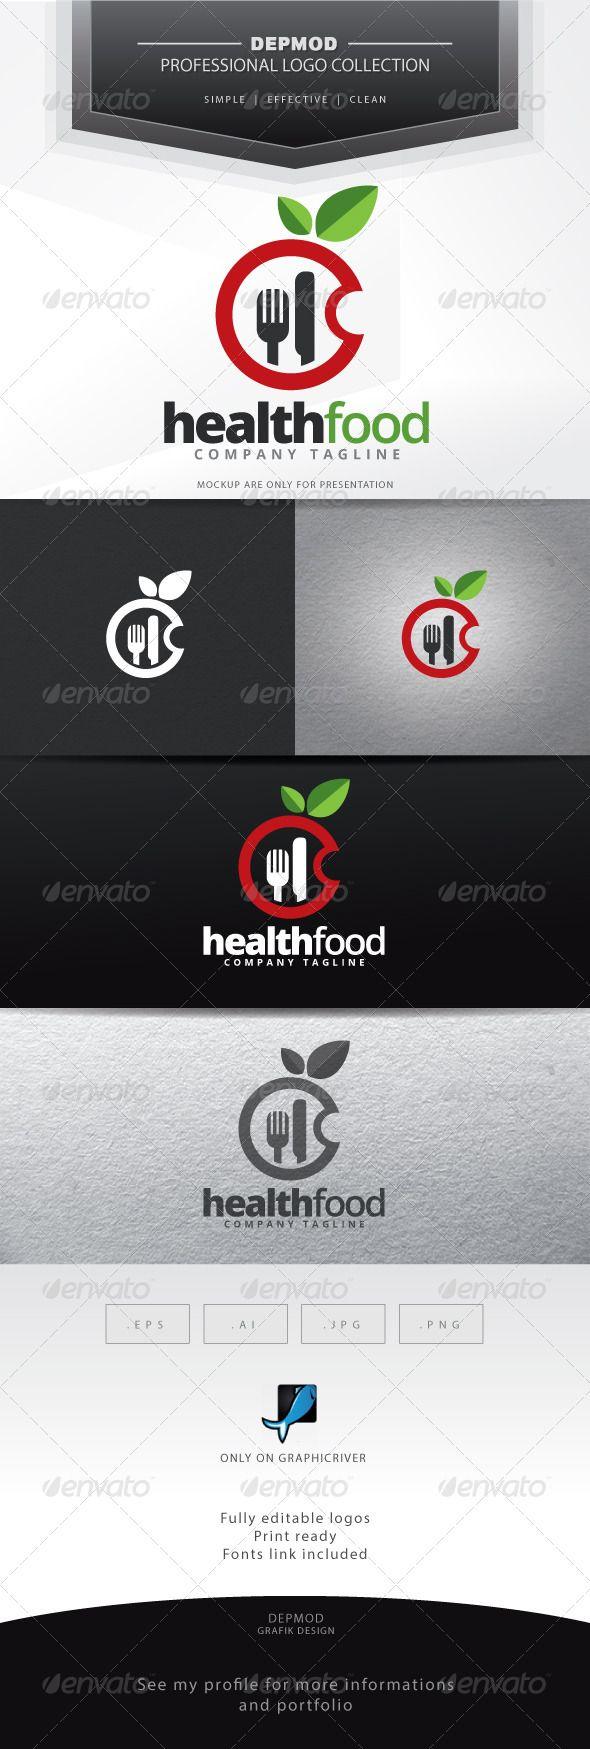 health food logo val di fiori sky logo logos e logo food